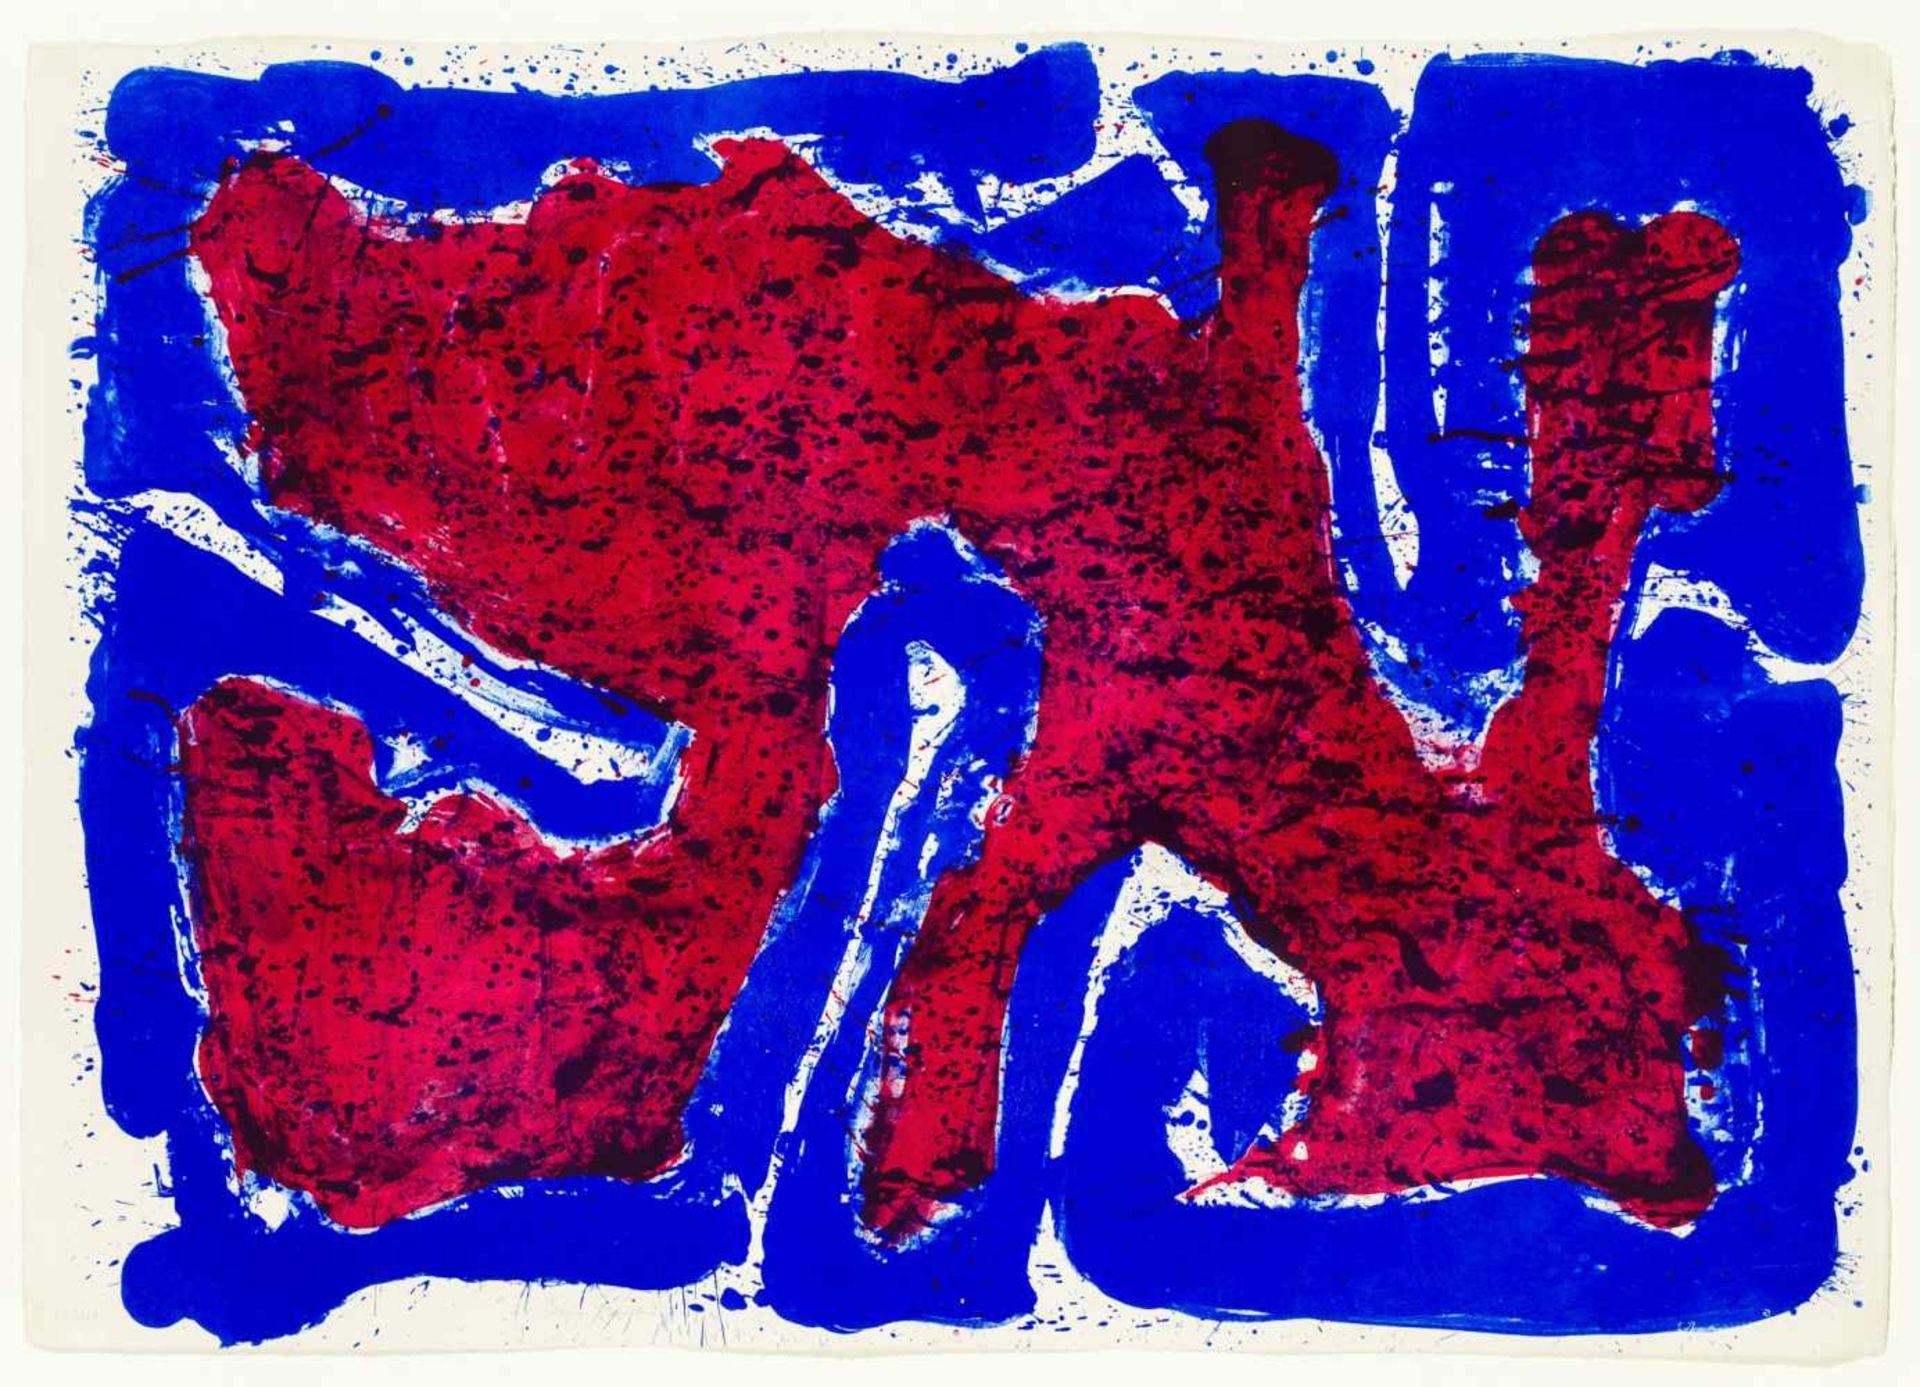 Los 27 - Sam Francis San Mateo 1923 - 1994 Santa Monica Serpent on the stone Farblithographie auf Papier 63,5